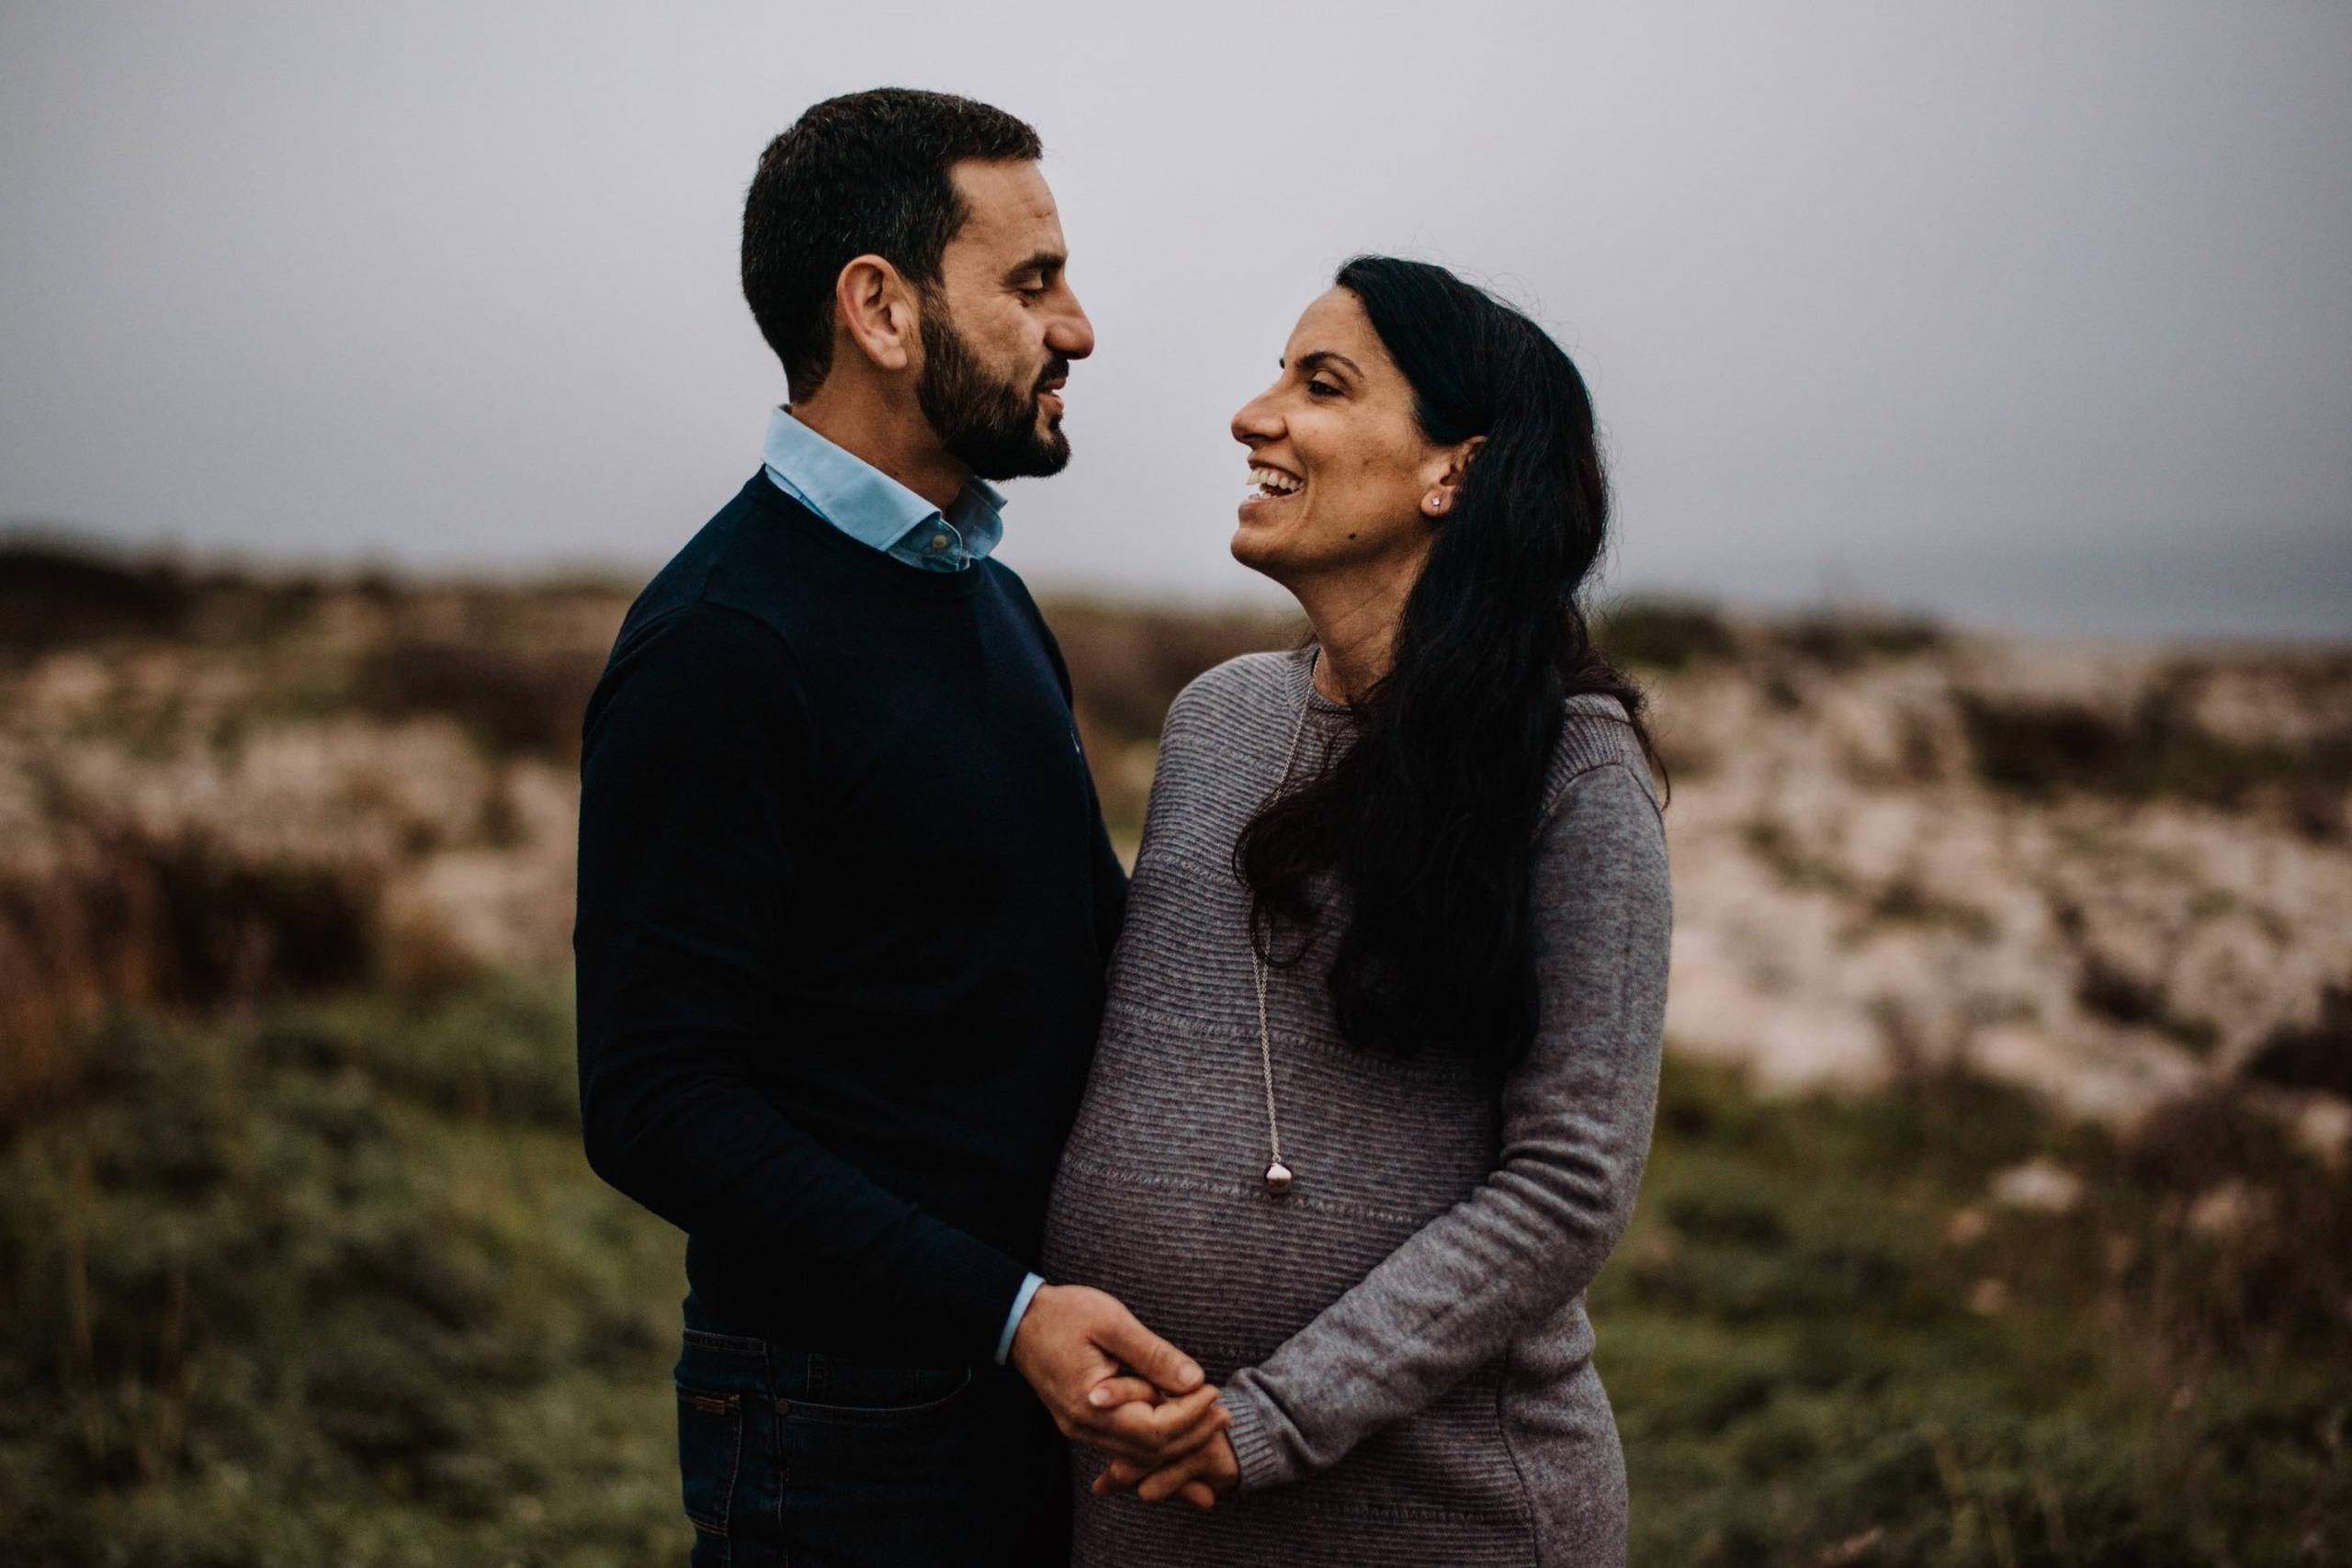 Intimate pregnancy photo shoot